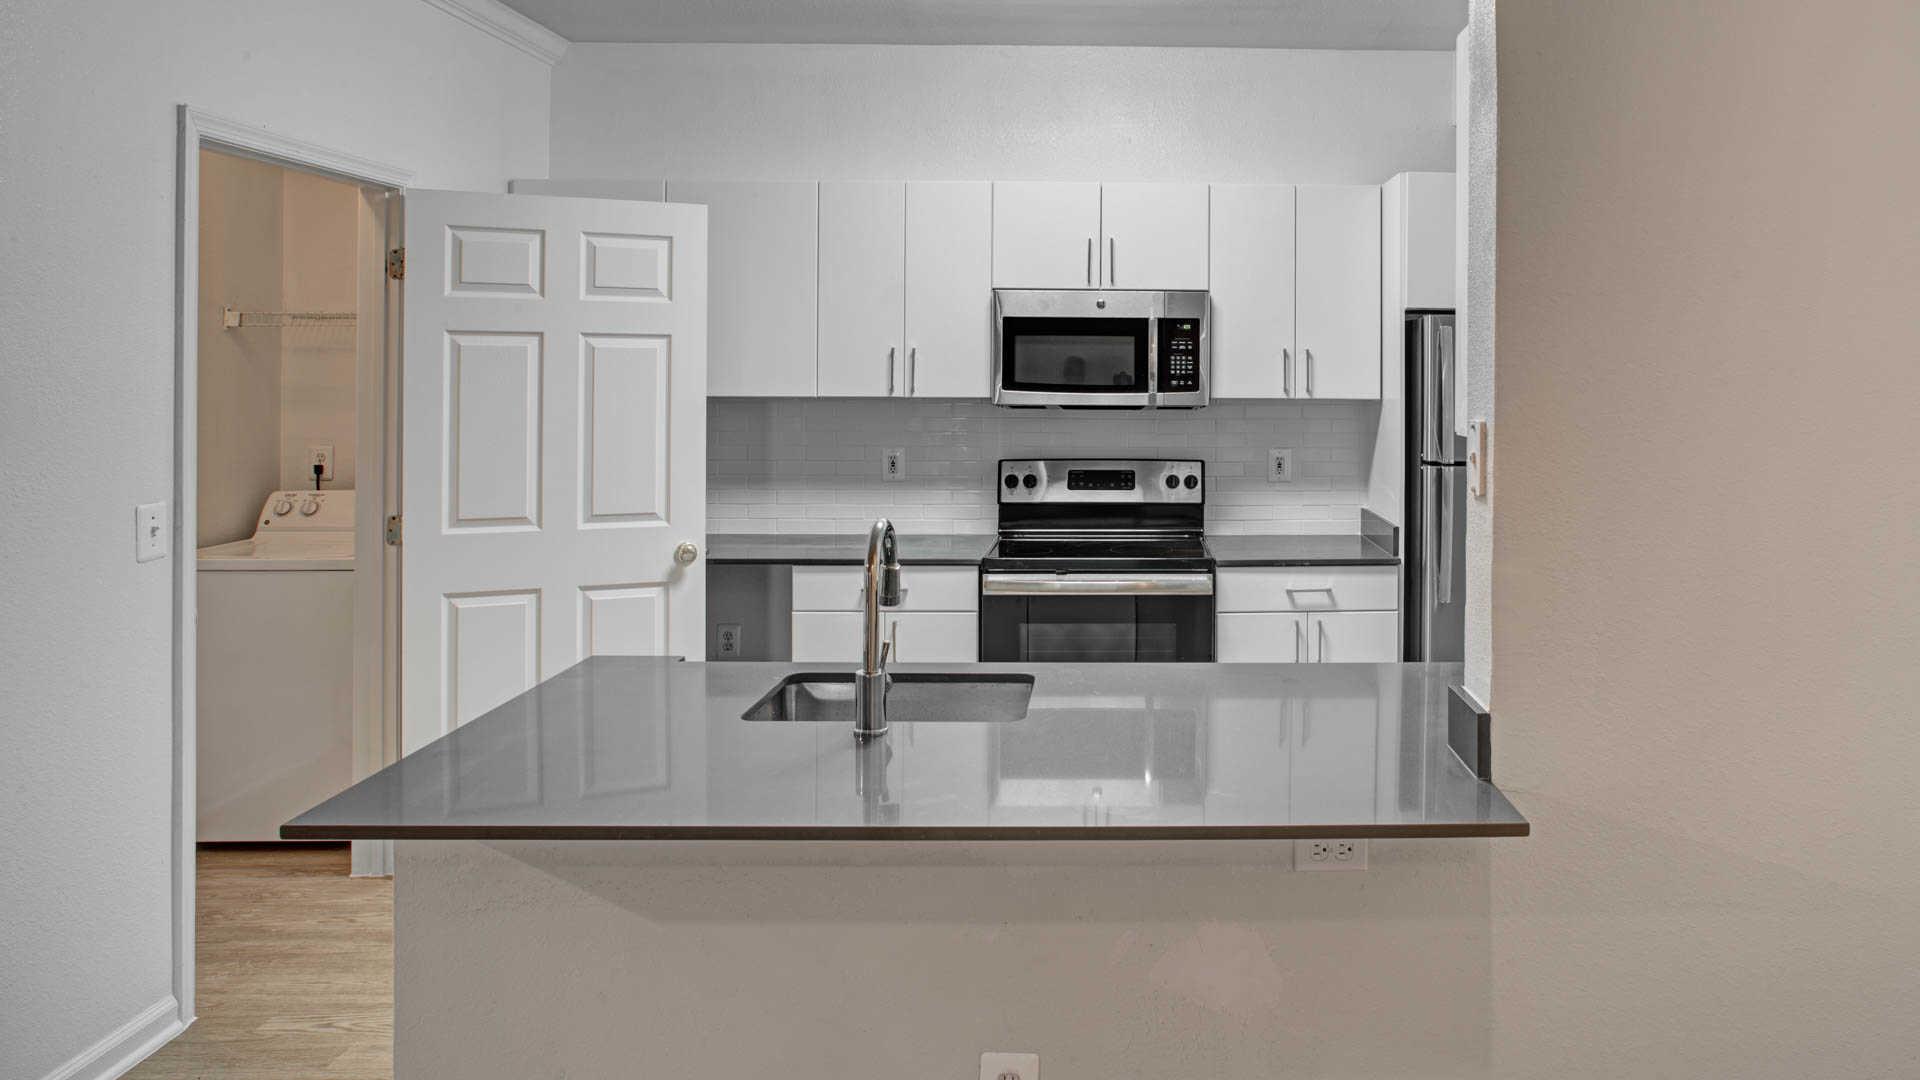 Ordinaire Reserve At Potomac Yard Apartments Reviews In Alexandria   3700 Jefferson  Davis Hwy | EquityApartments.com